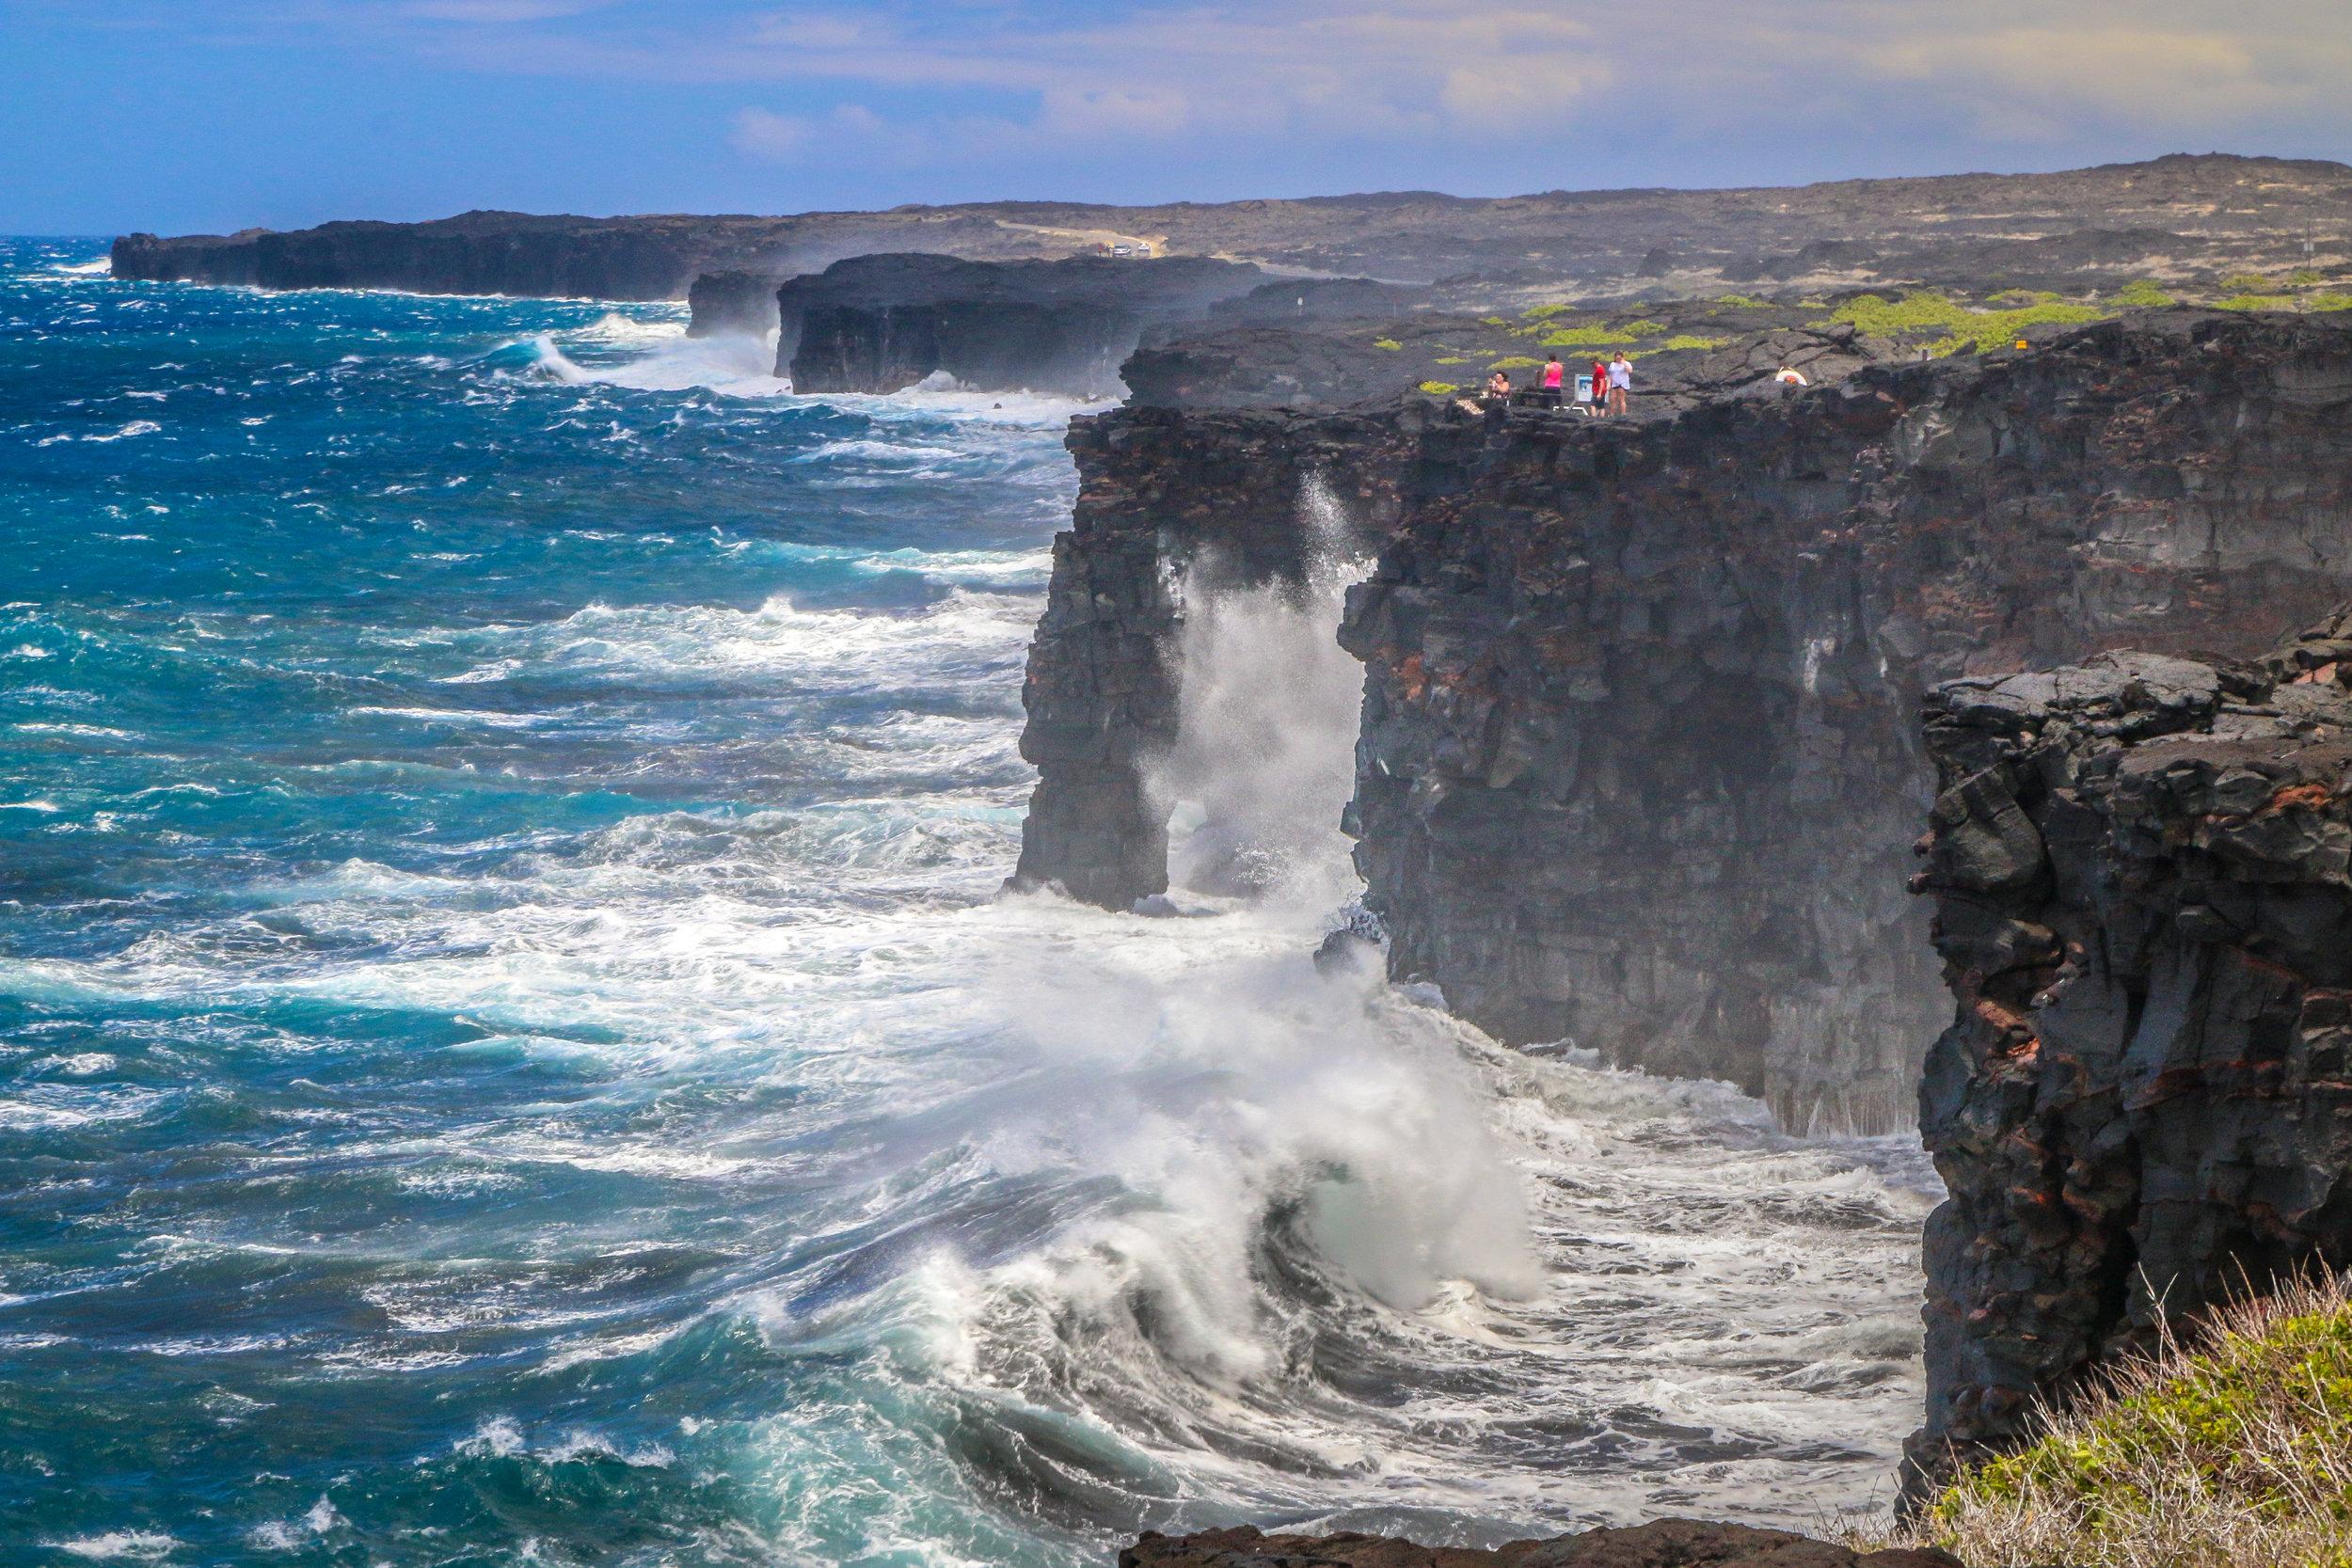 Hawaii HI Big Island Photos Photography waves crashing Volcano National Park